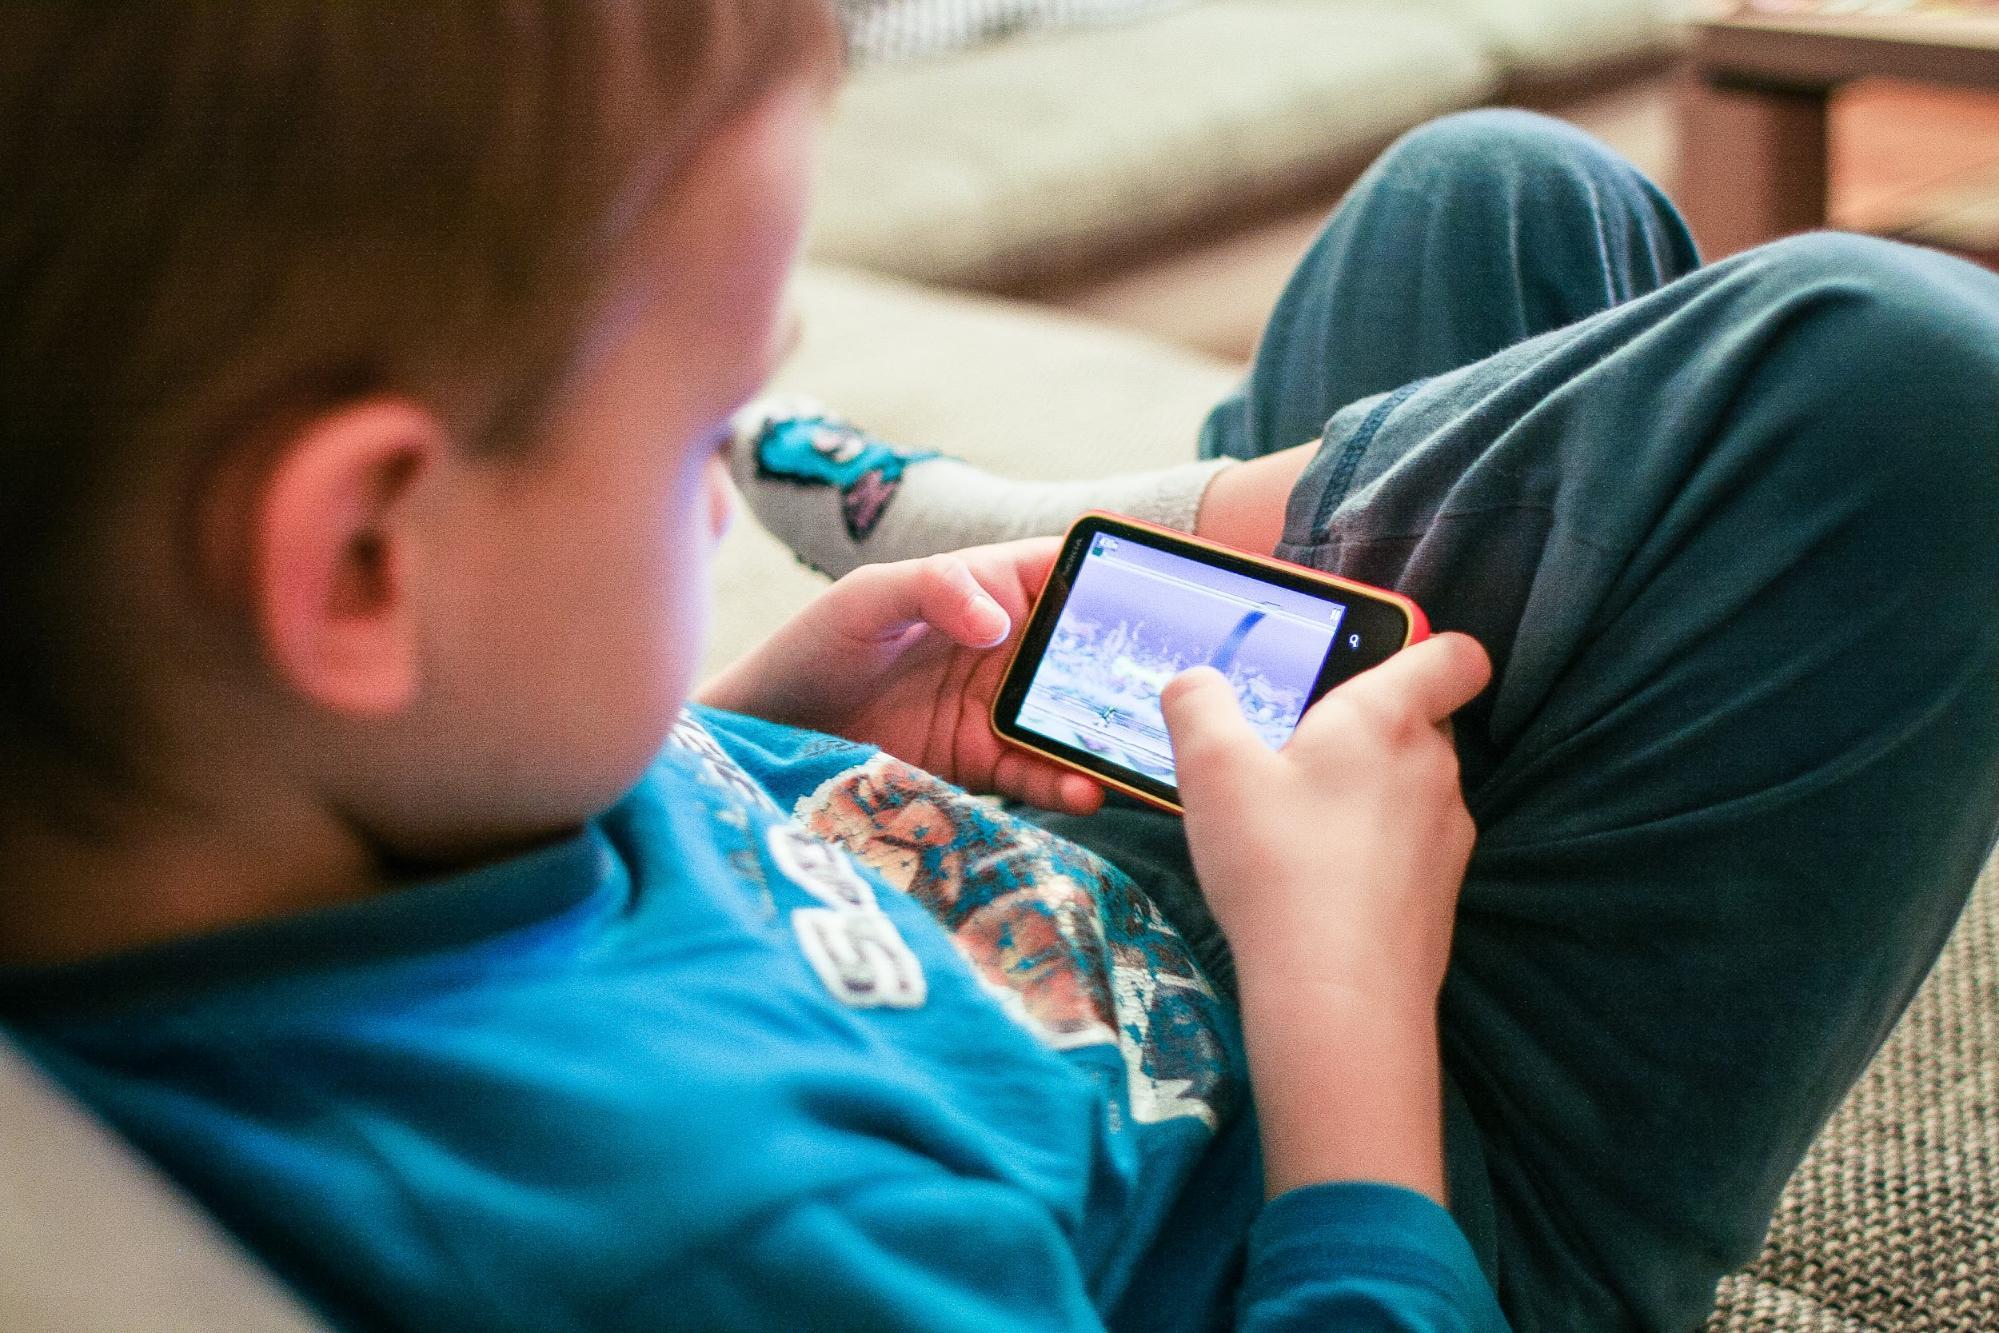 Limit screentime boy on smartphone